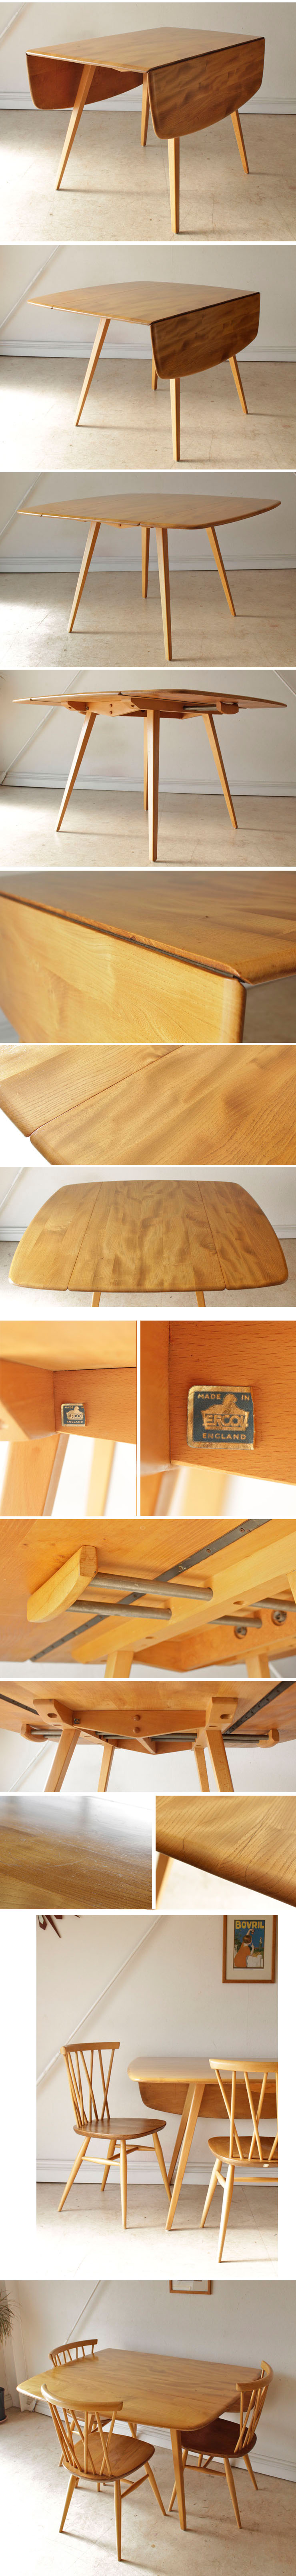 ERCOLアーコール【スクエア】ダイニングテーブル・ドロップリーフ/イギリス製ビンテージ家具アンティーク